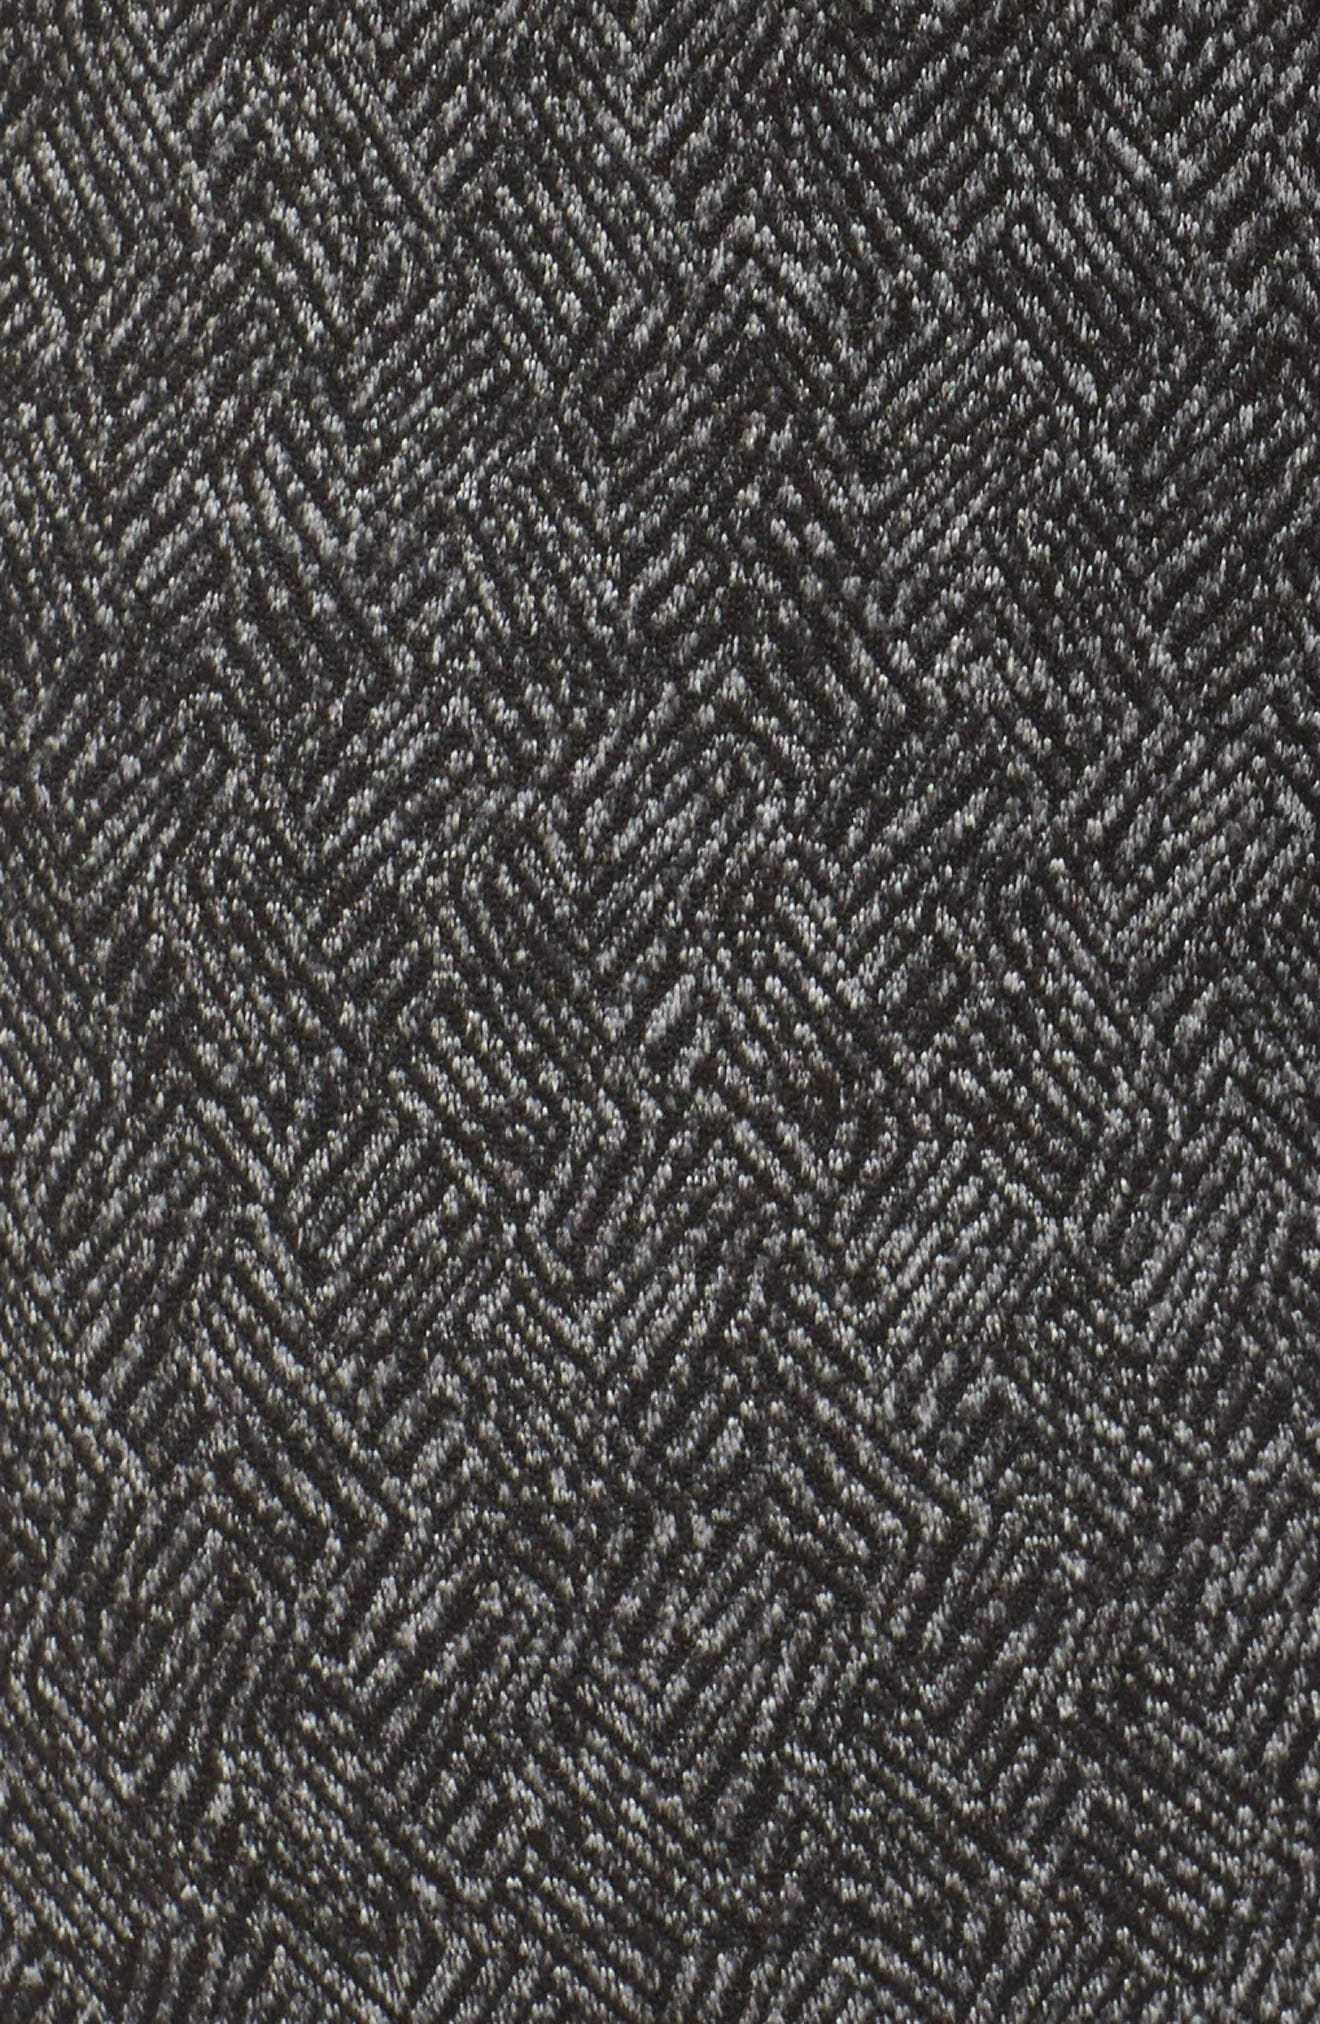 Optic High Waist Leggings,                             Alternate thumbnail 5, color,                             001